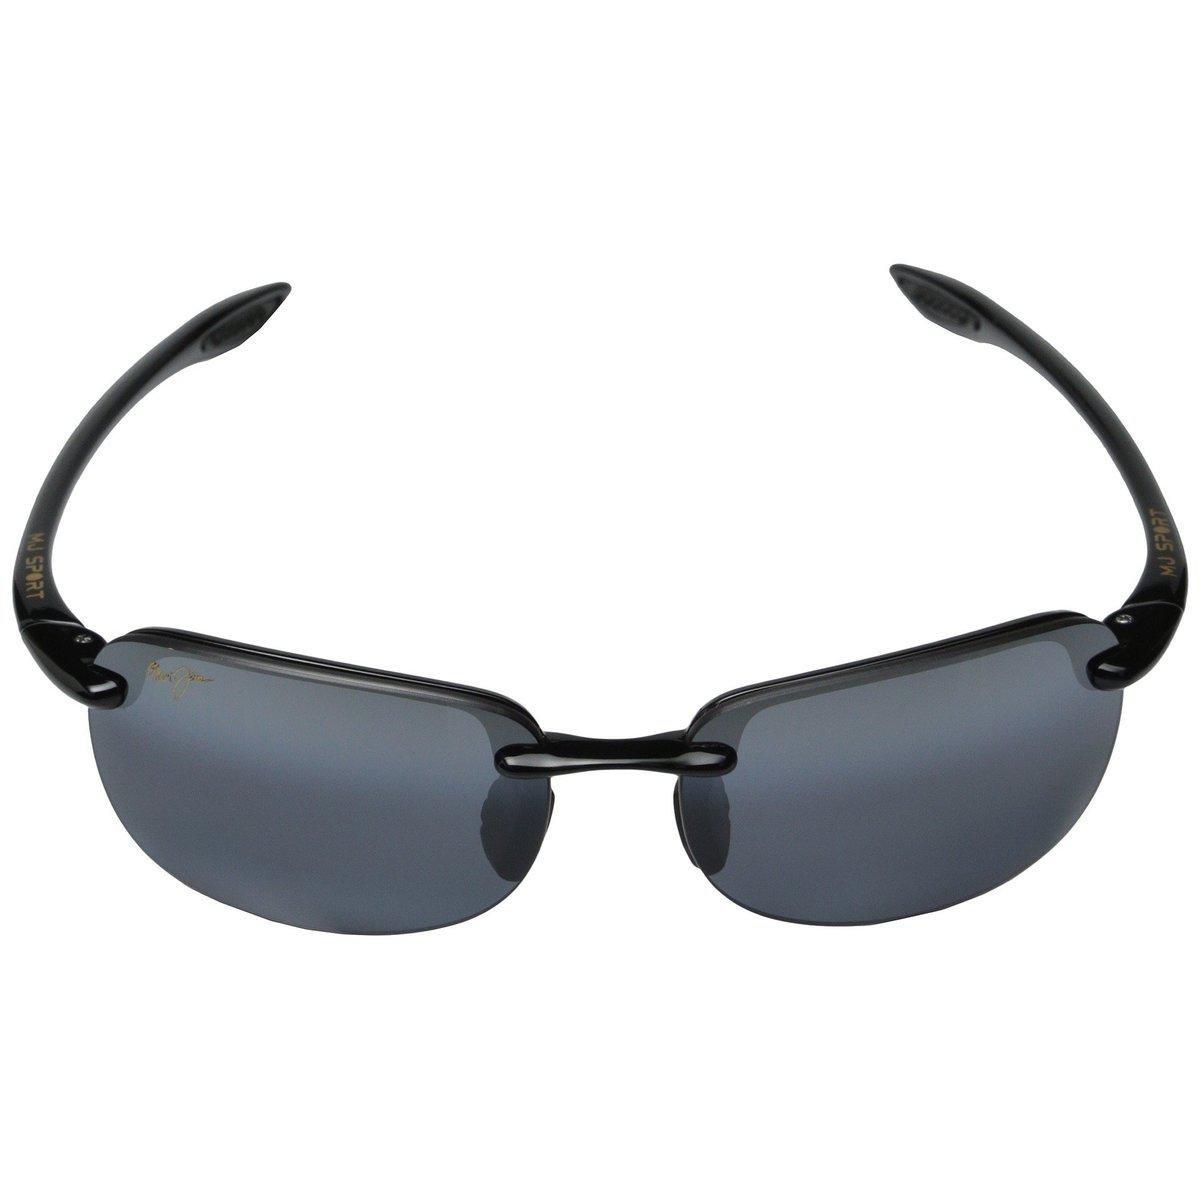 3b93115cde ... Sandy Beach Polarized Sunglasses - Lyst. View fullscreen